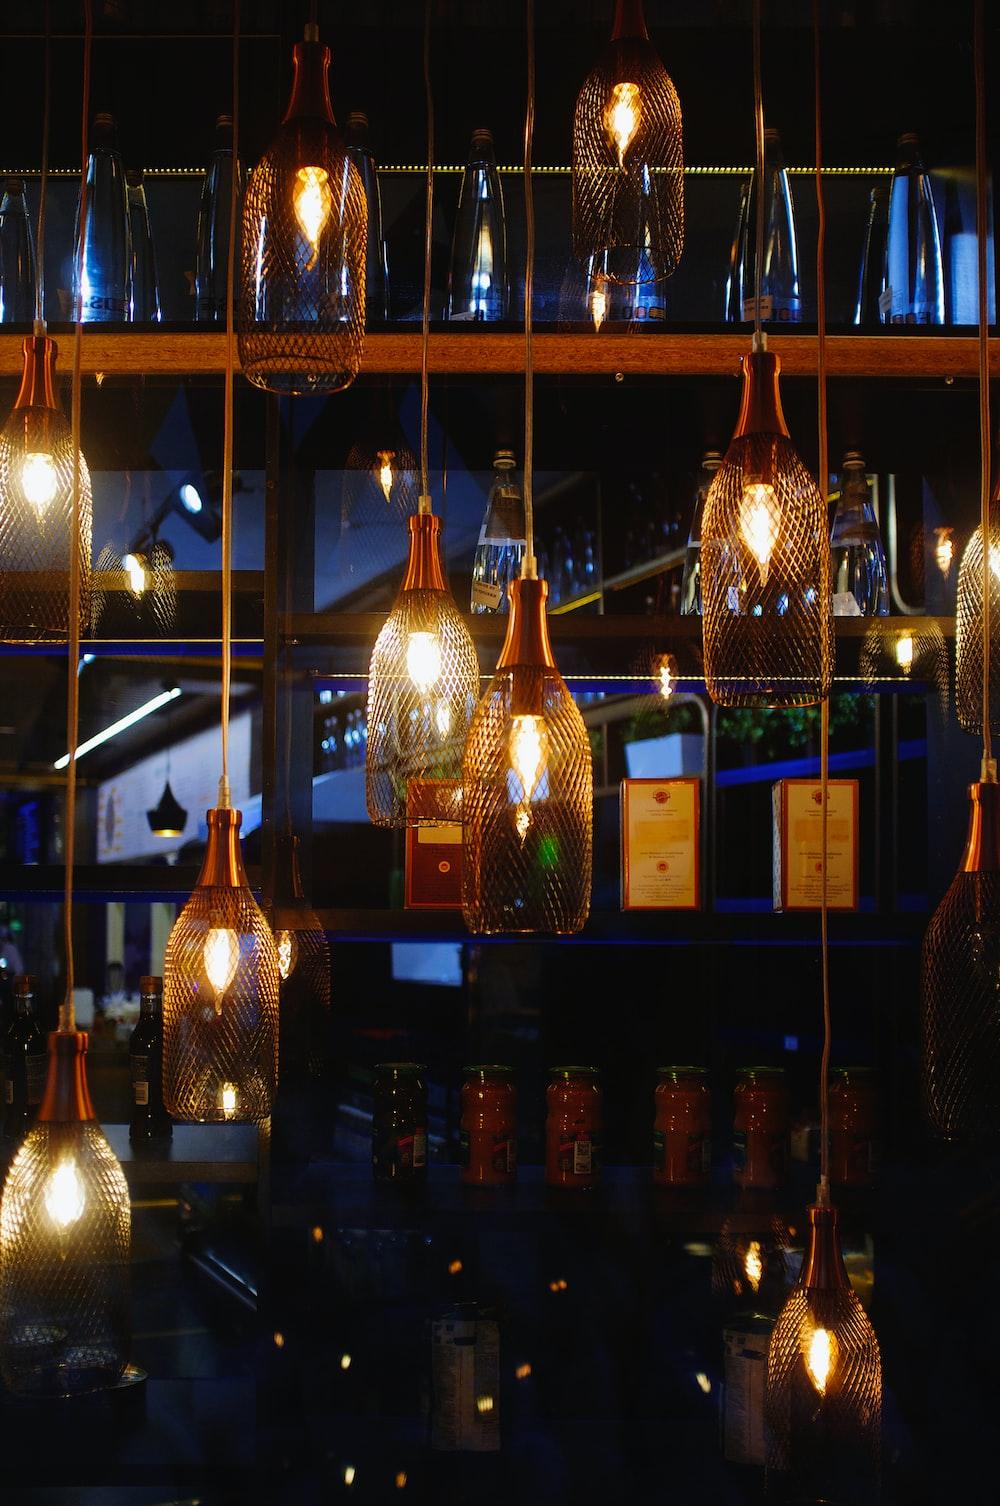 clear glass bottles on brown wooden shelf